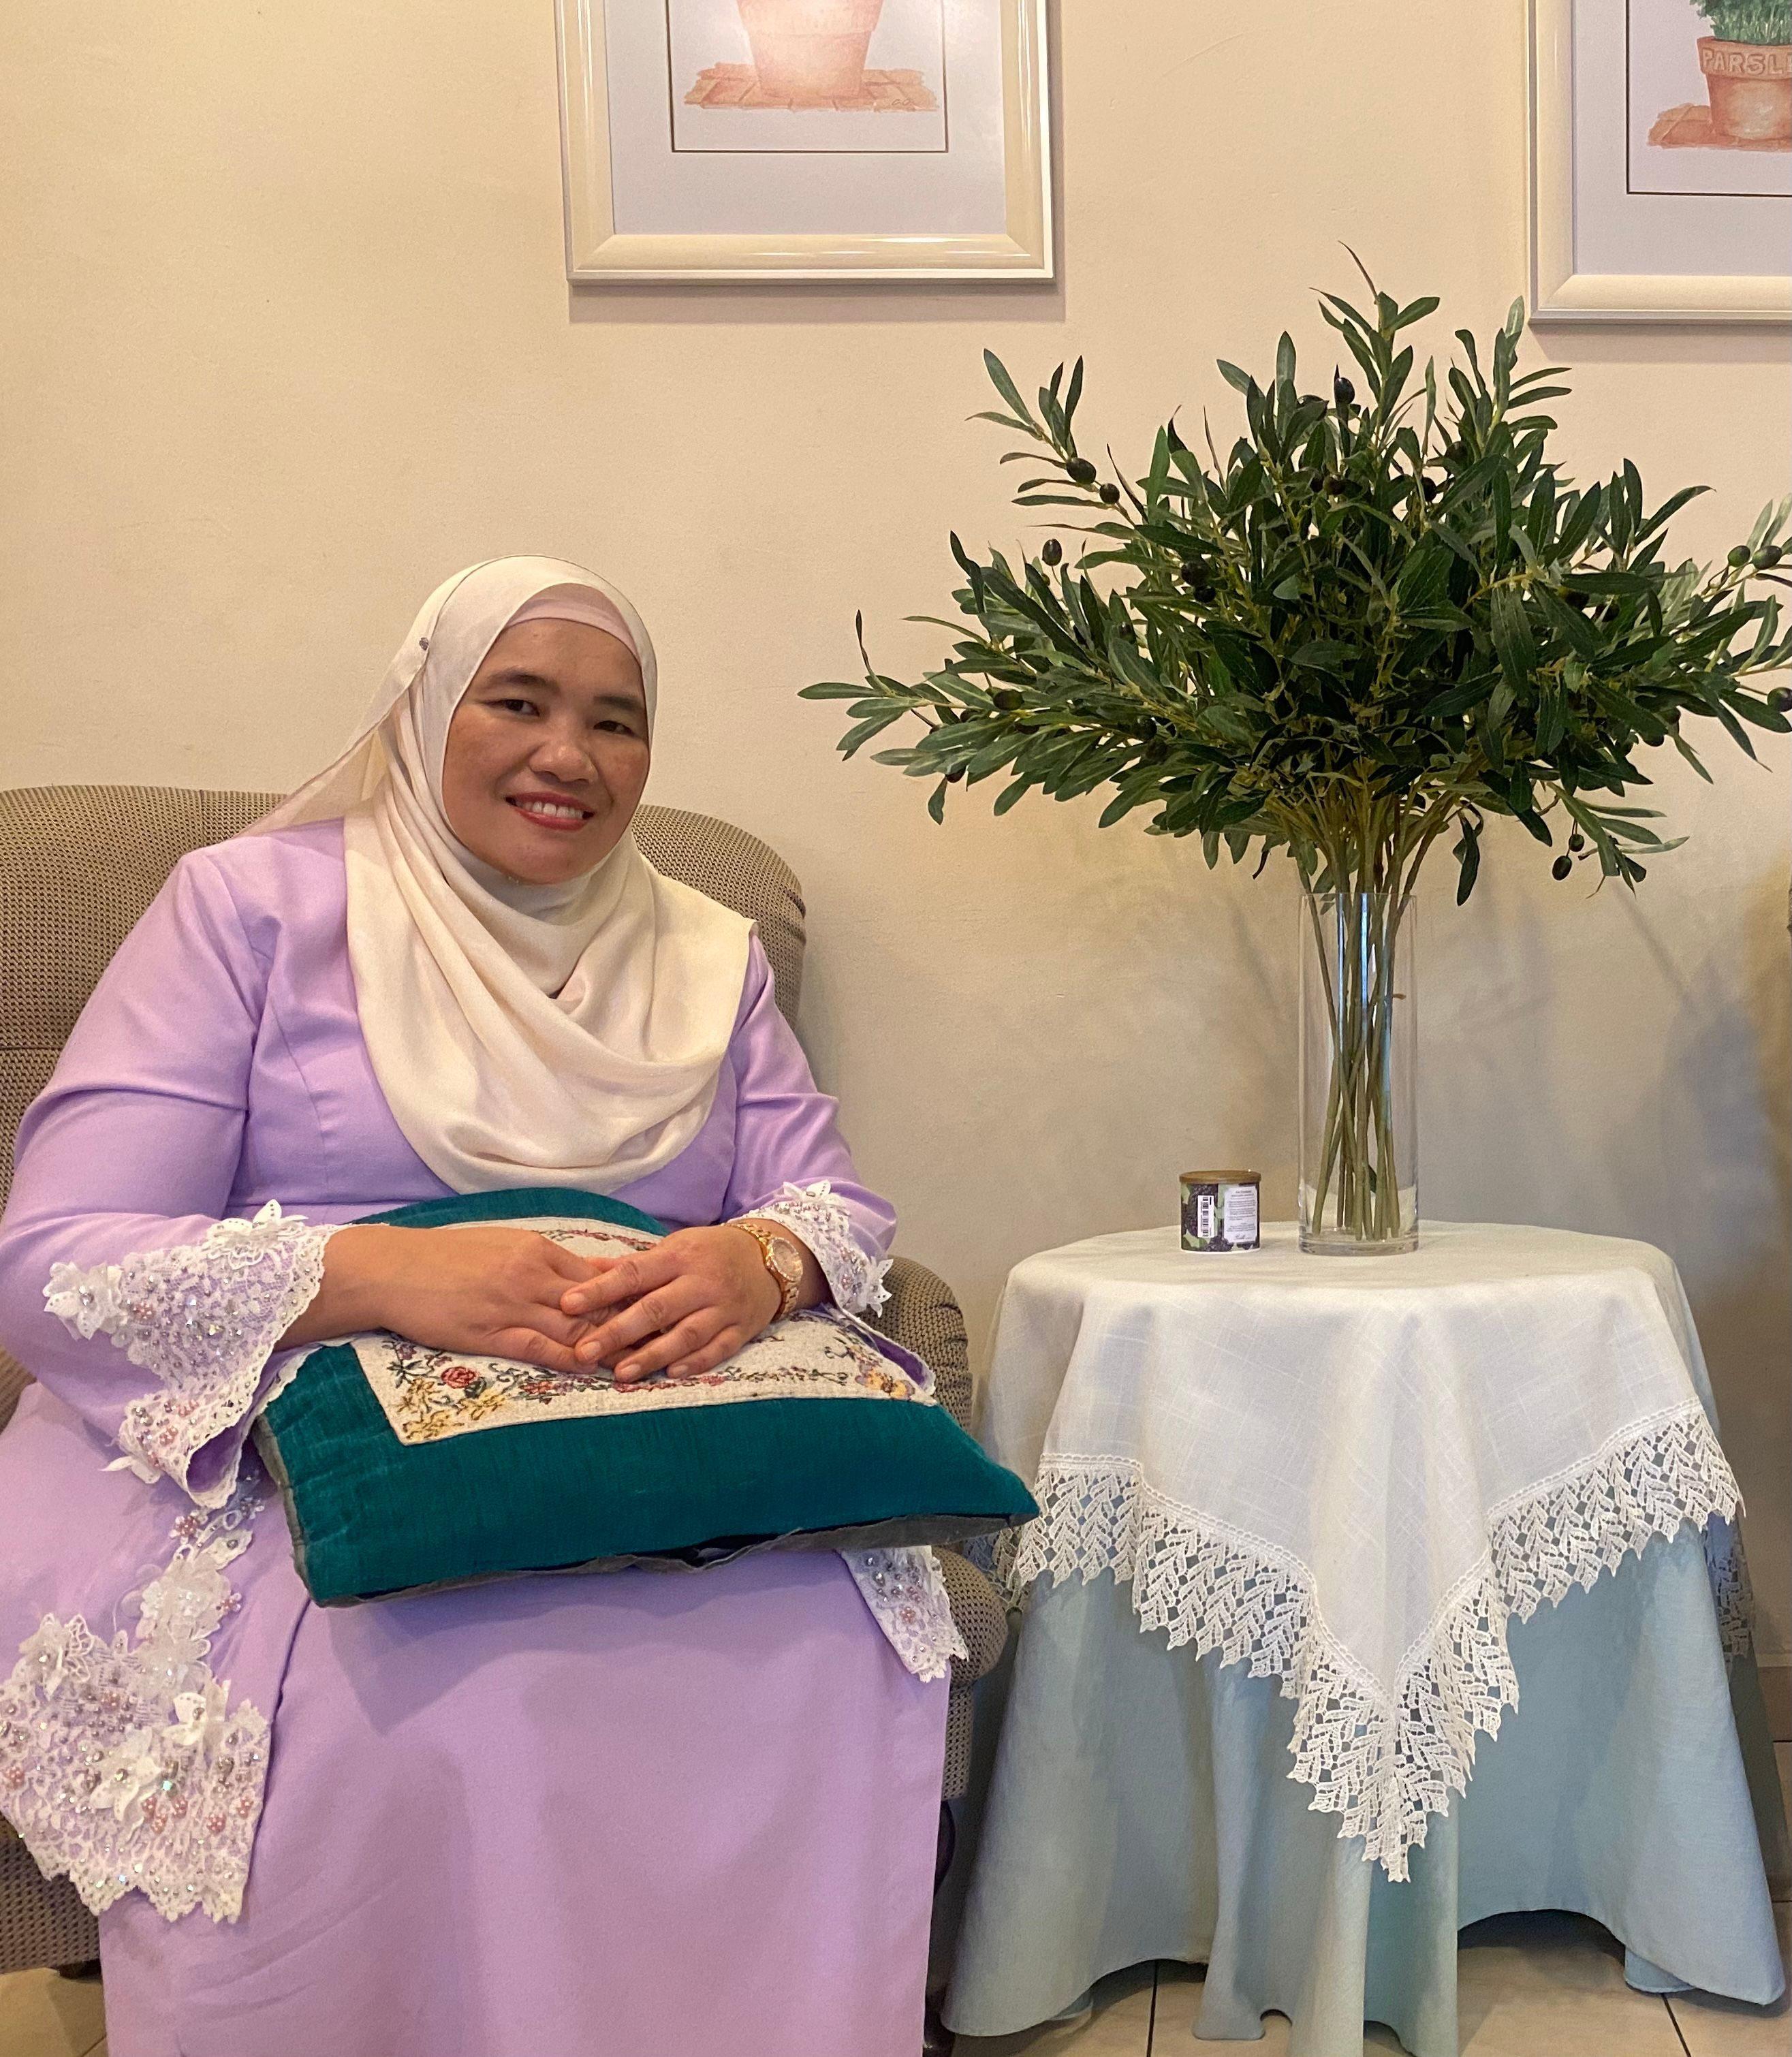 Mariam Binti Abd Jalal poses at home. She is smiling in a purple baju kurung. It is Hari Raya Aidilfitri.